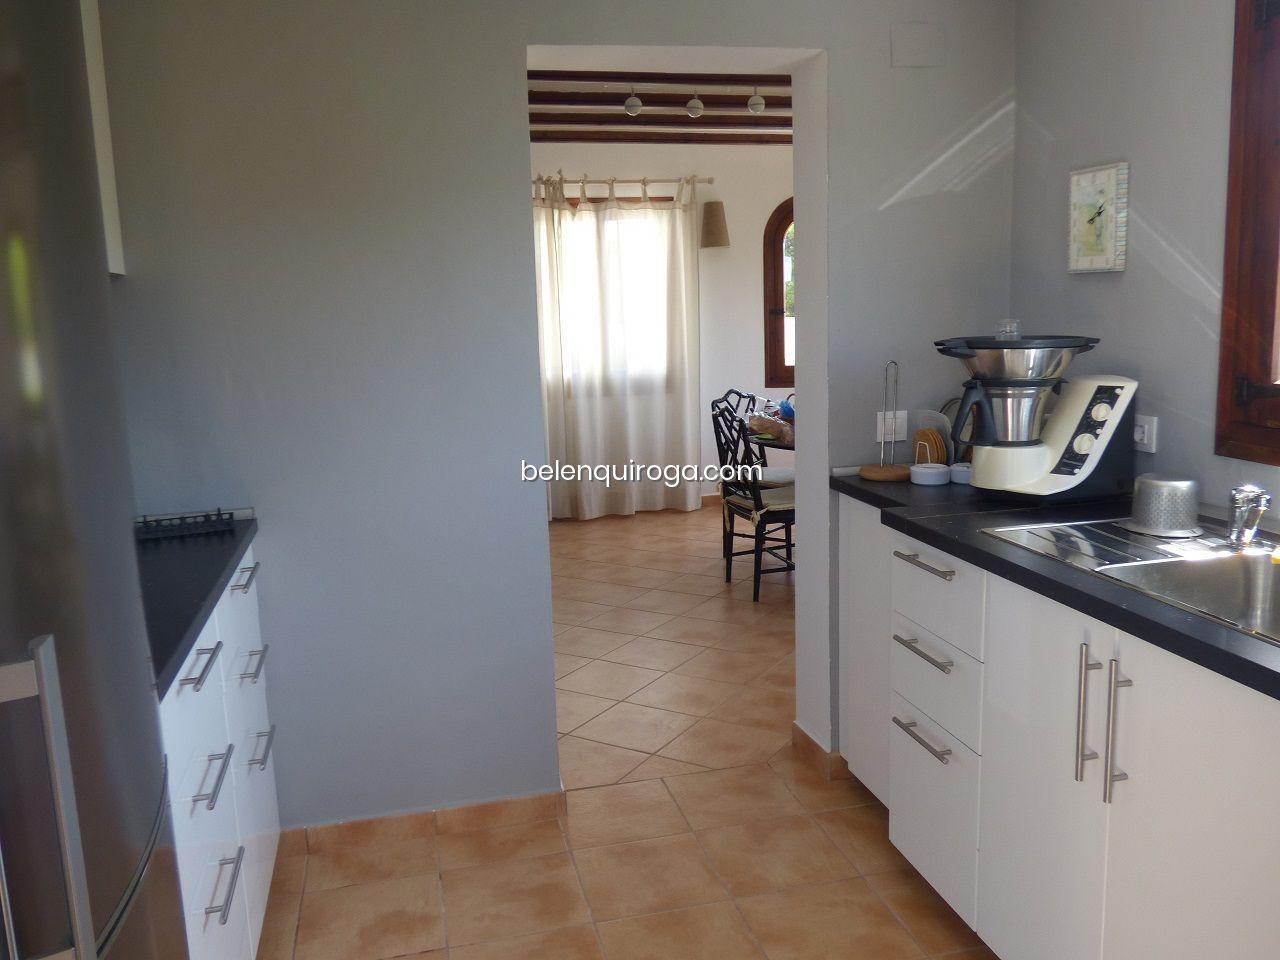 Villa reformada – Inmobiliaria Belen Quiroga